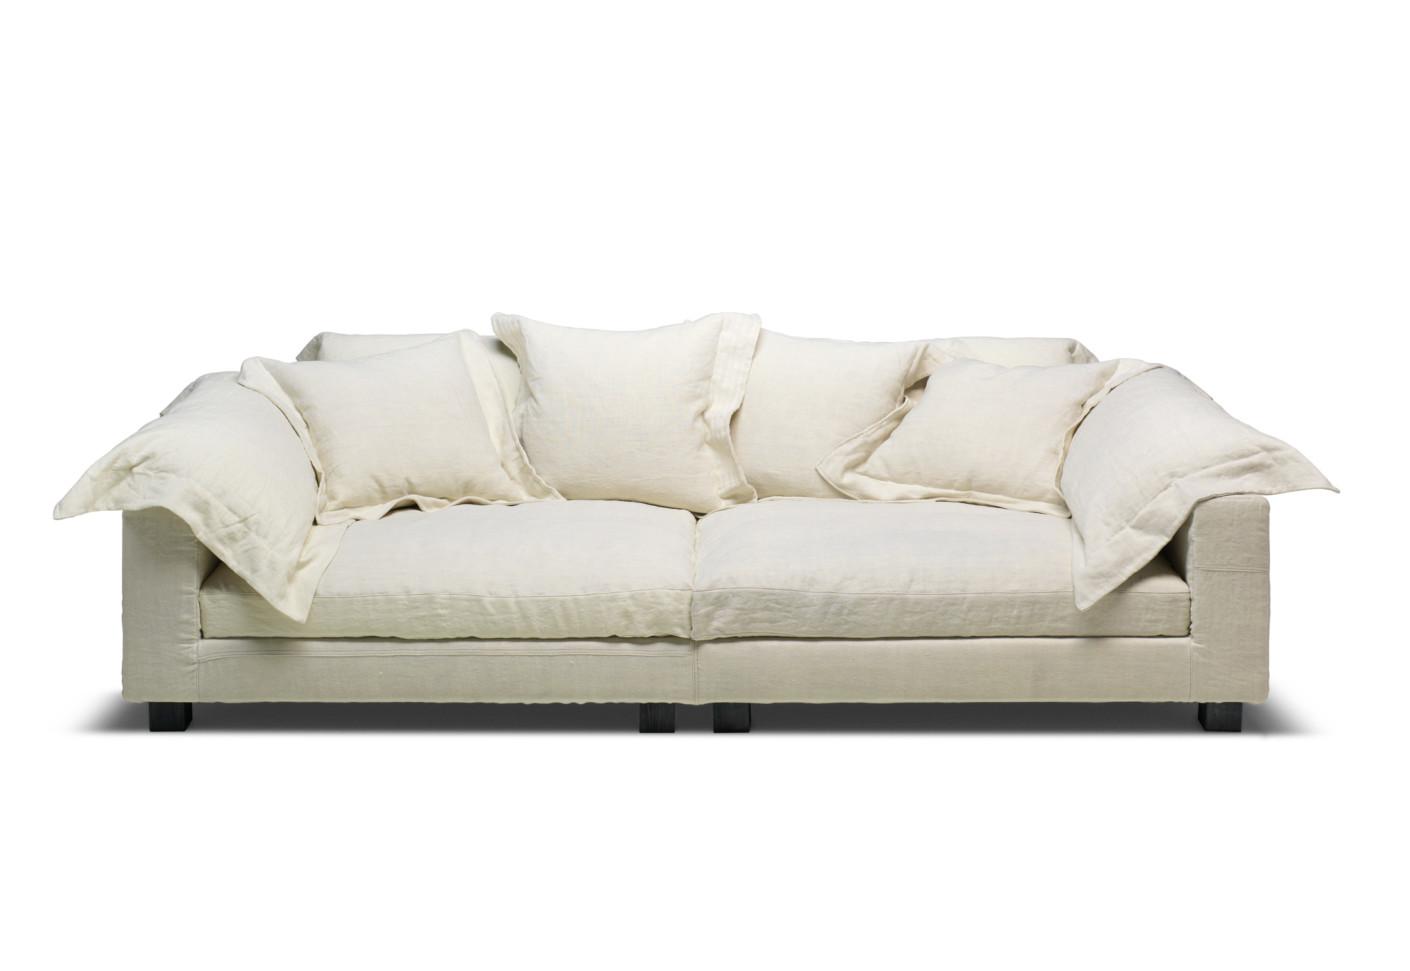 moroso sofa thesofa. Black Bedroom Furniture Sets. Home Design Ideas